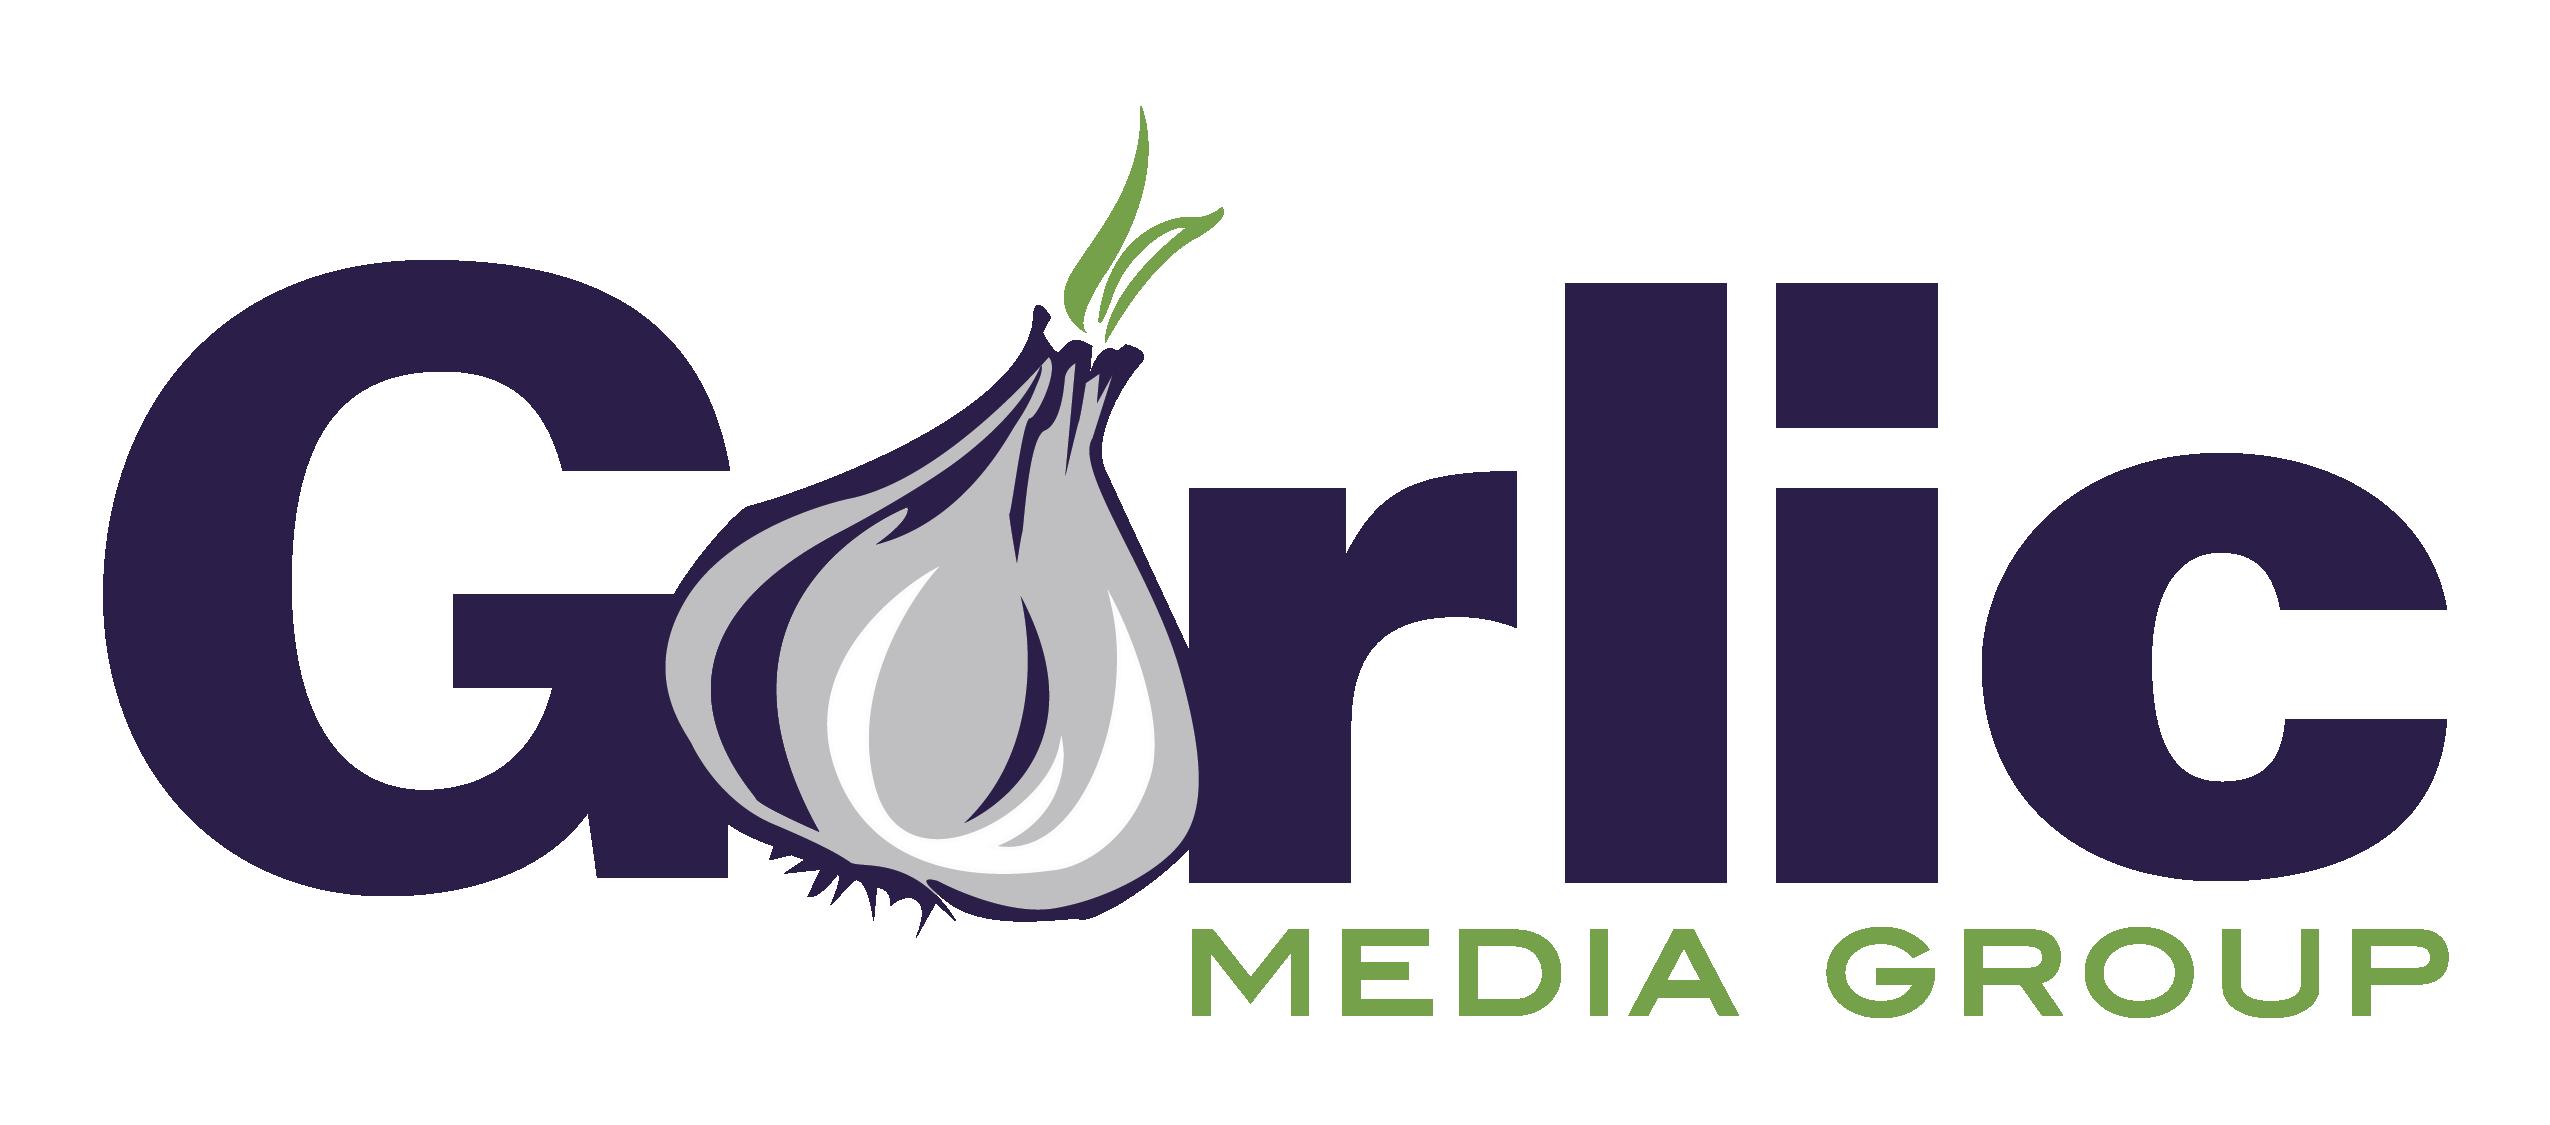 Garlic Media Group